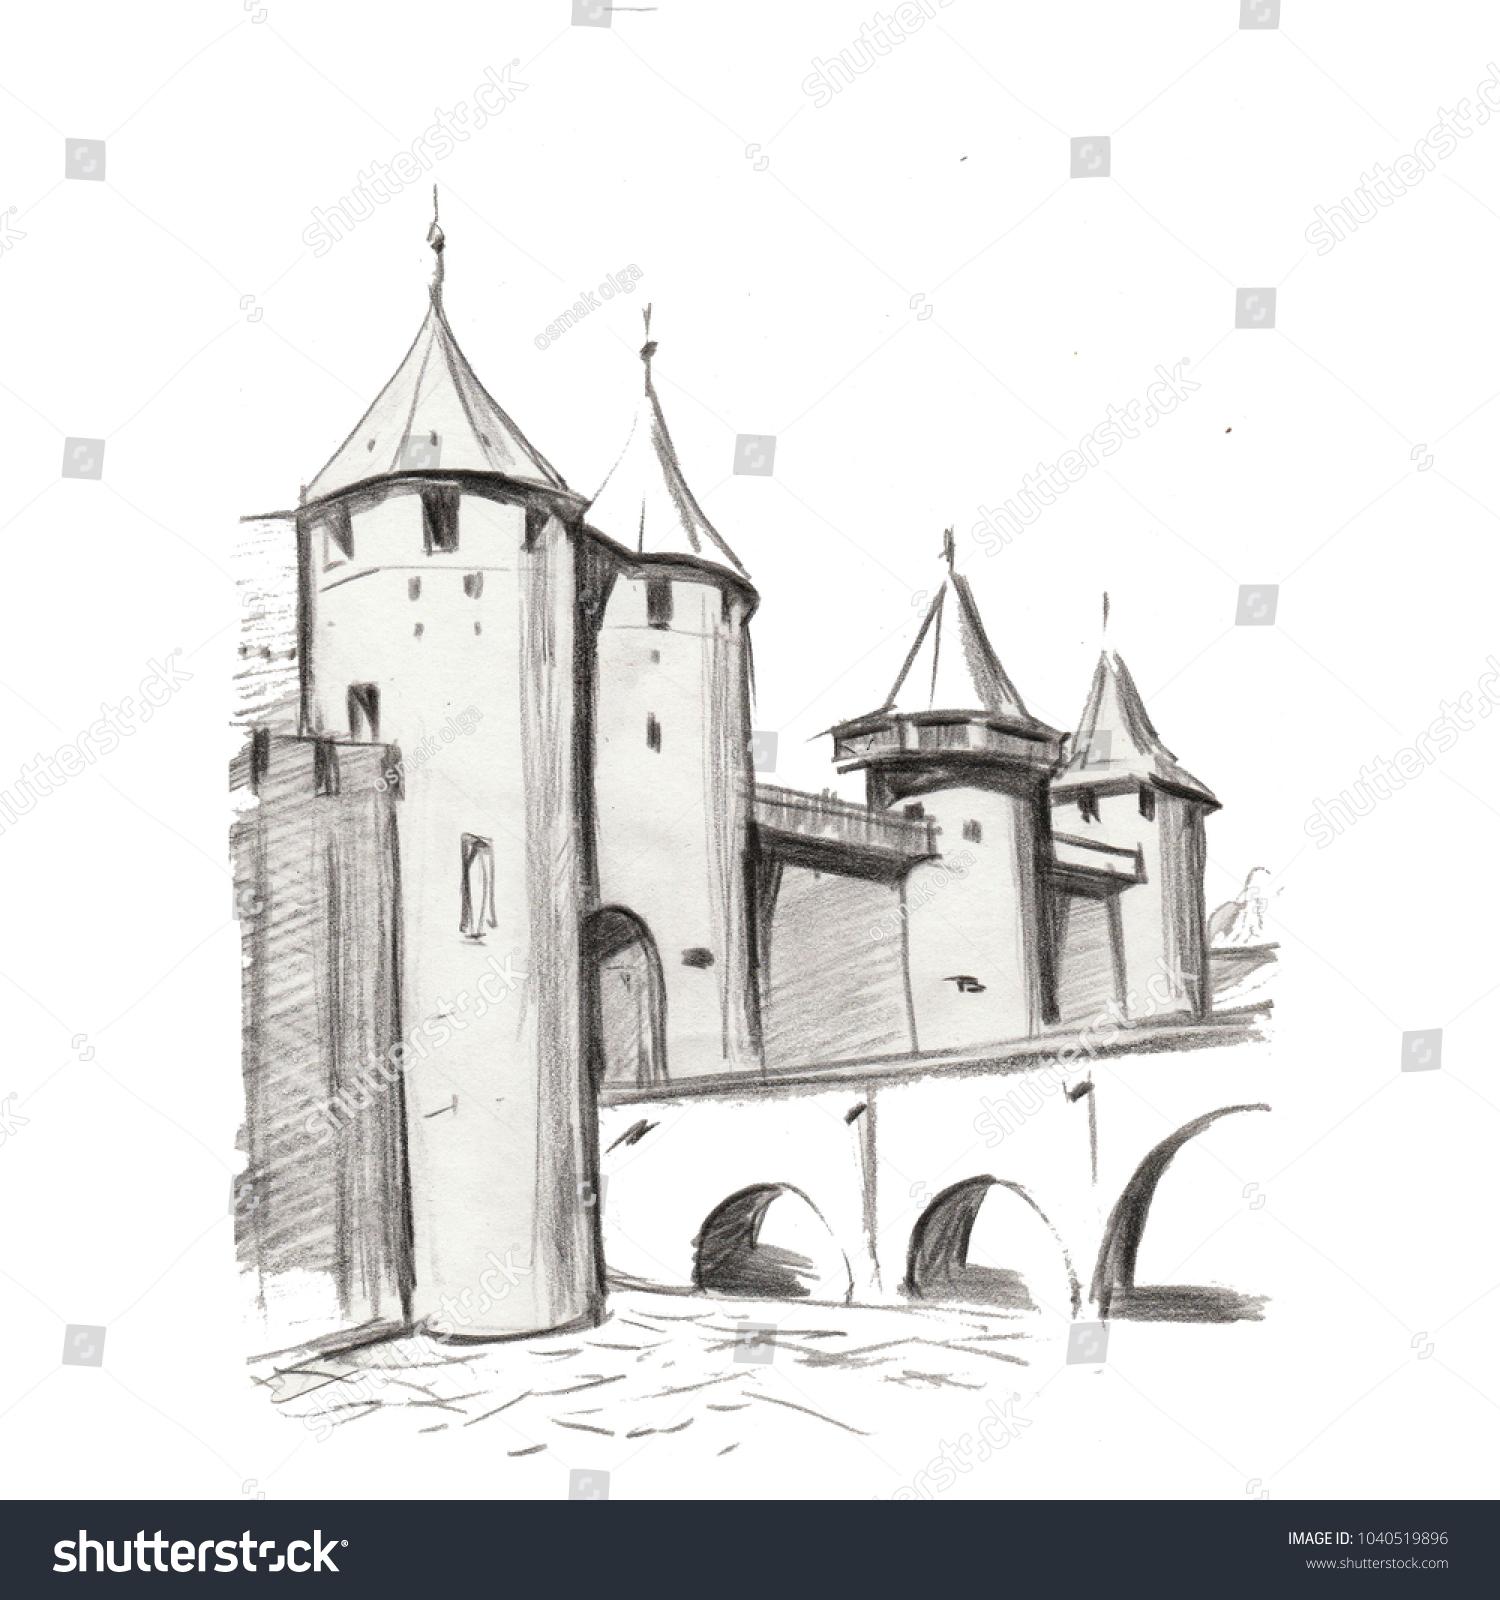 Illustration hand pencil drawing landscape architecture nature building historical castle town gothic bridge old ansient composition